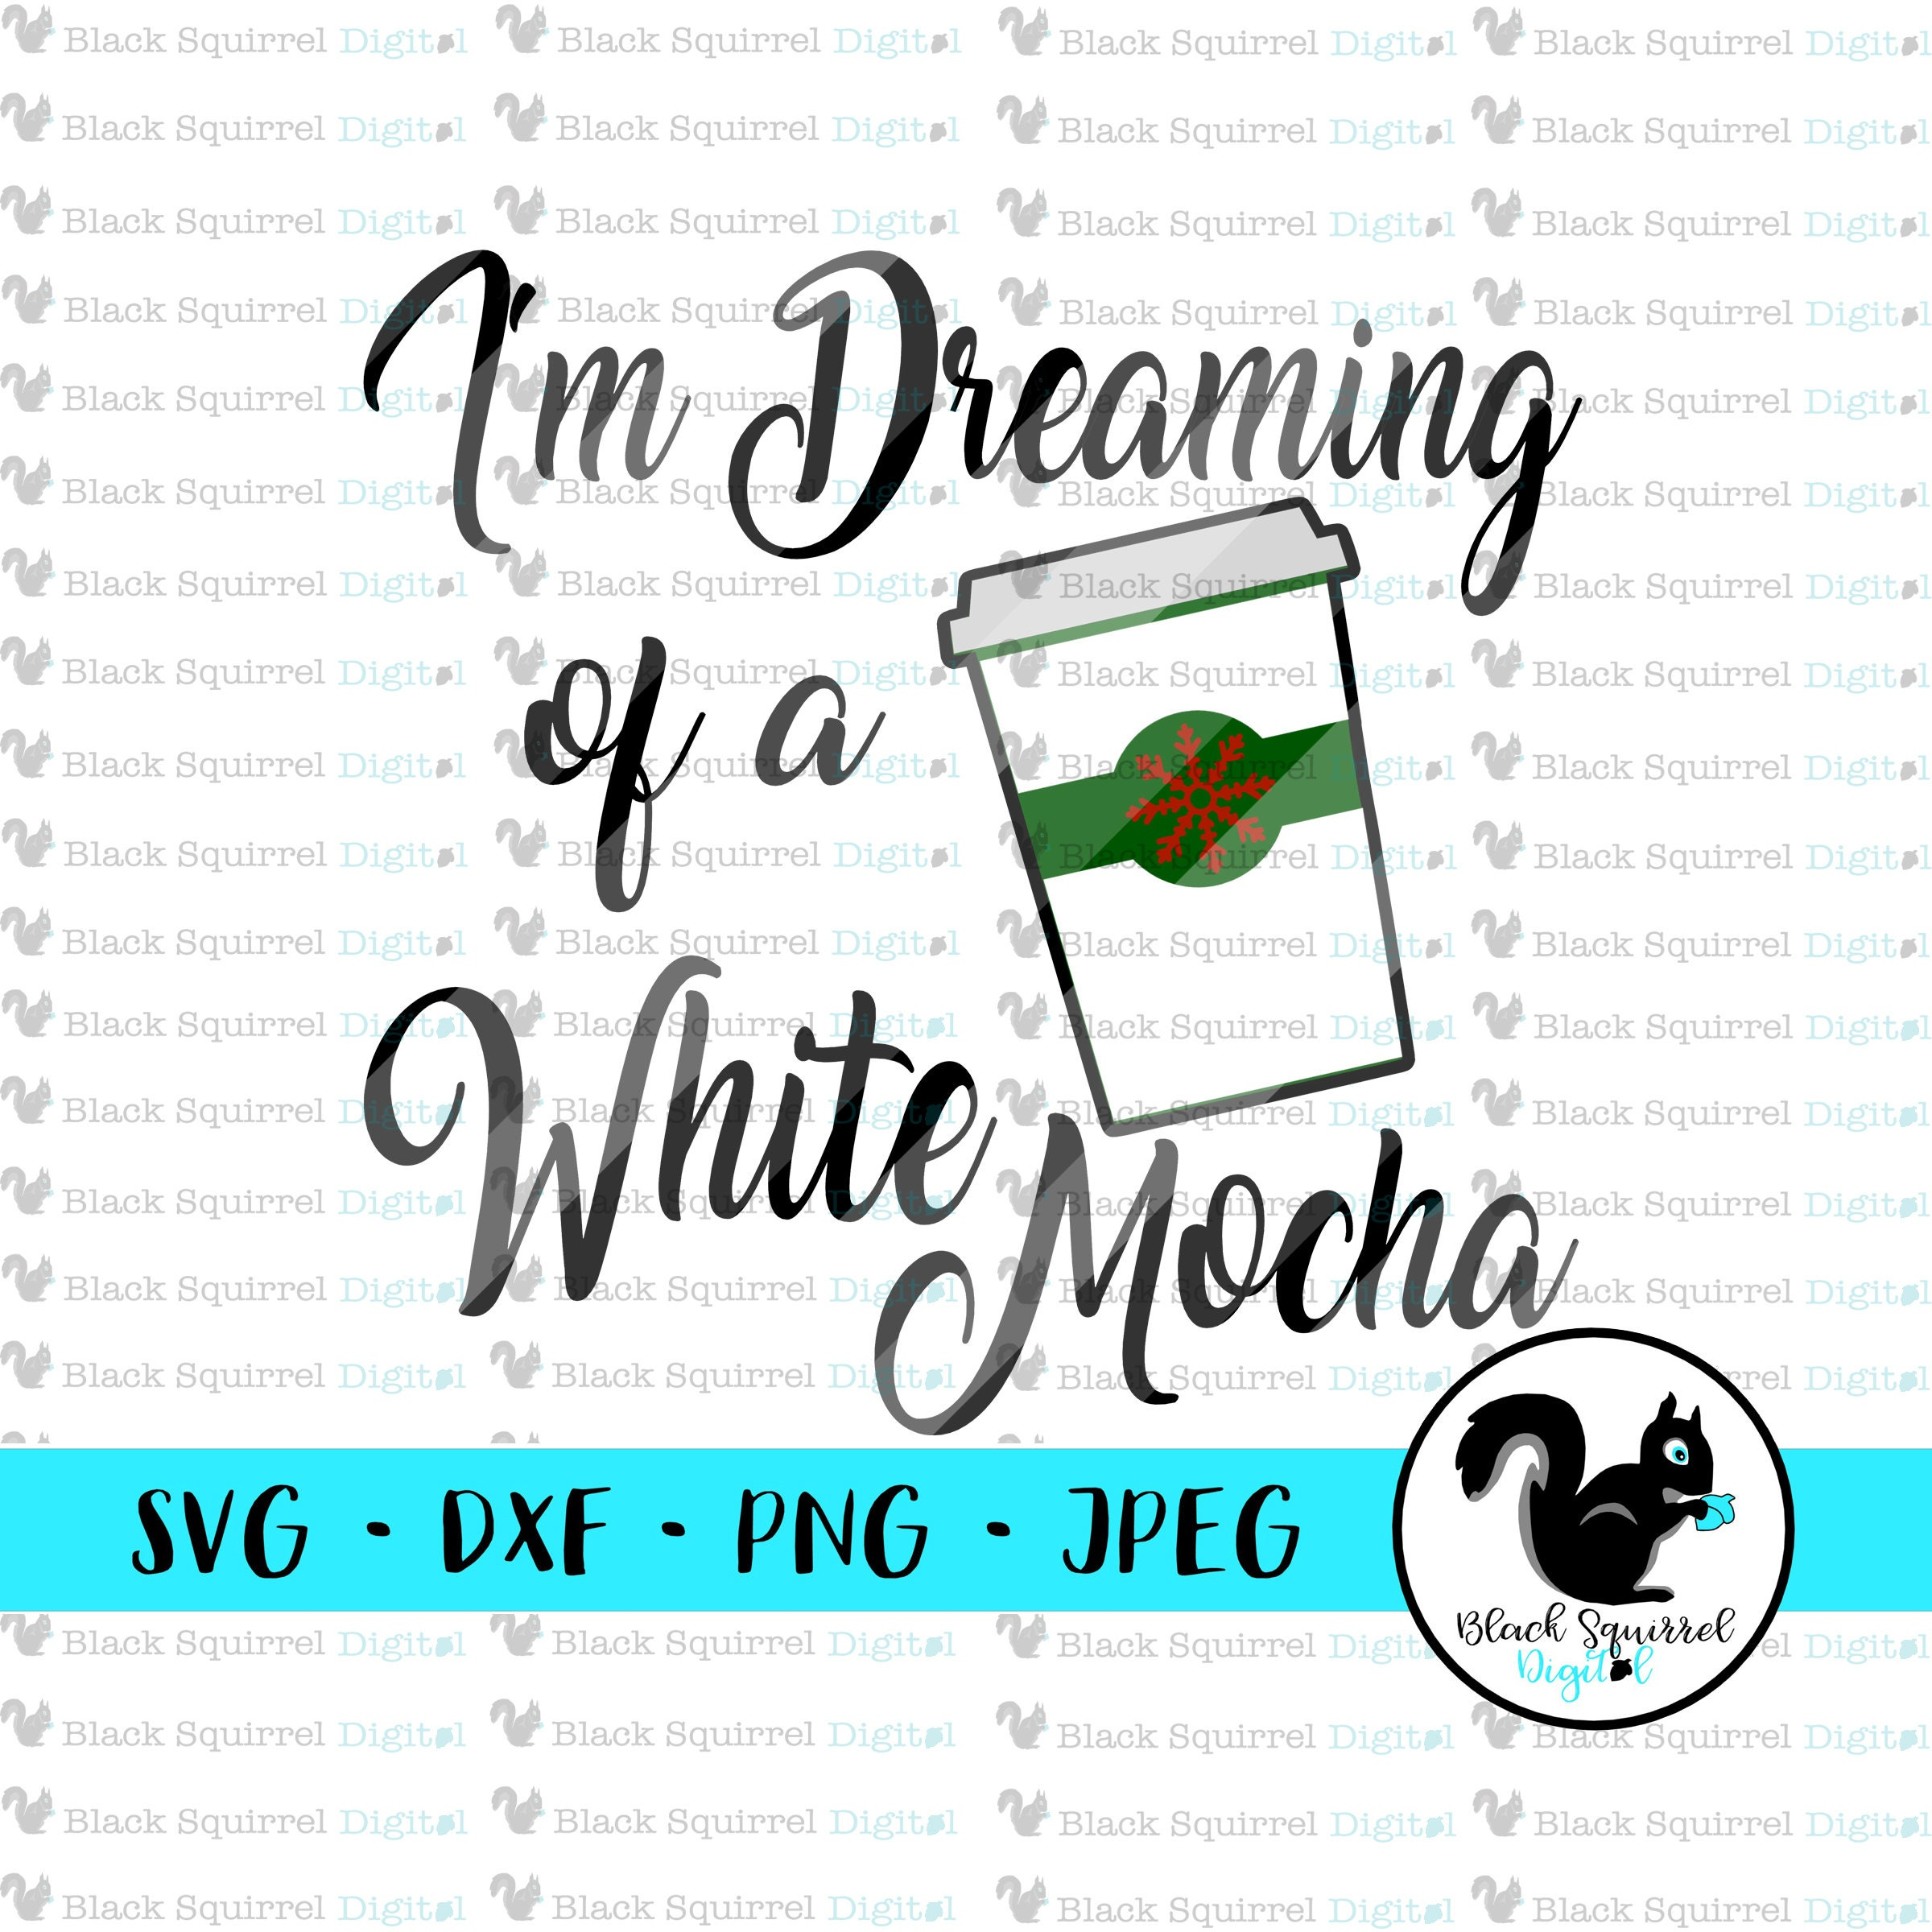 I\'m Dreaming of a White Mocha Funny Christmas saying SVG | Etsy